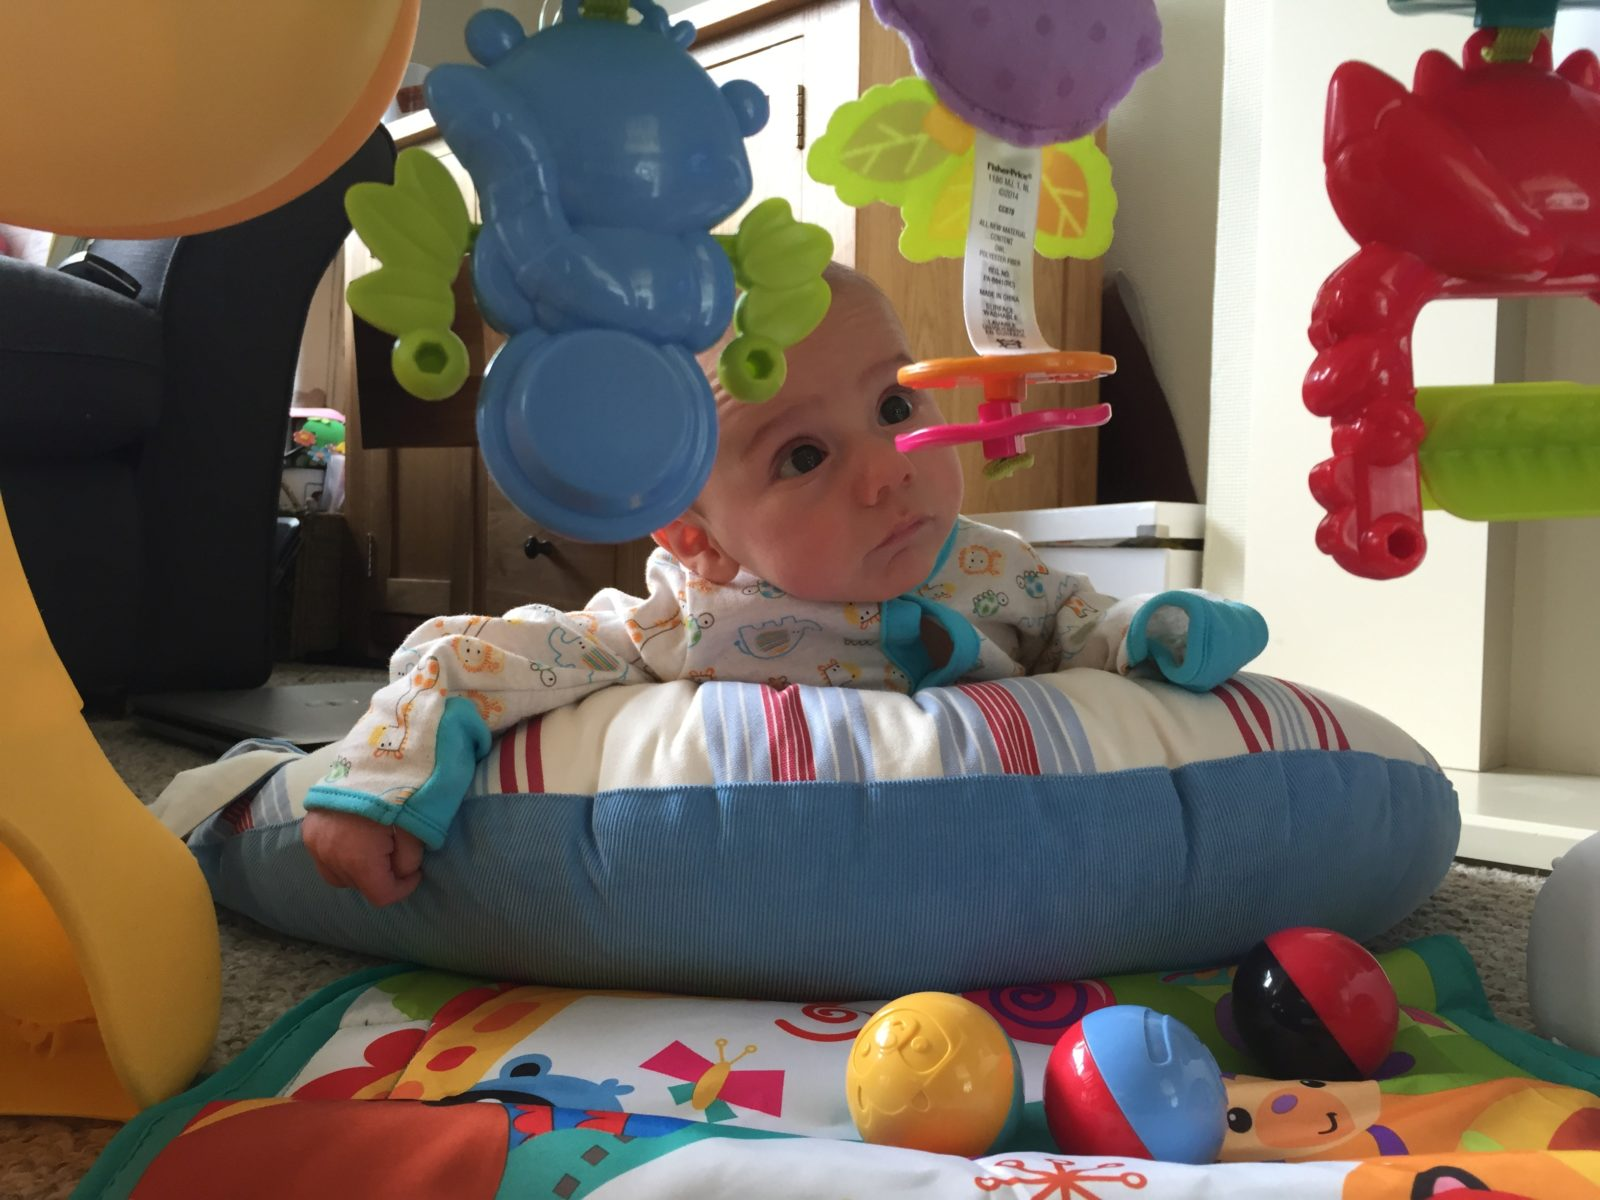 tomy print play lpr n months mats water age infant toddler mat h baby itm aqua splash